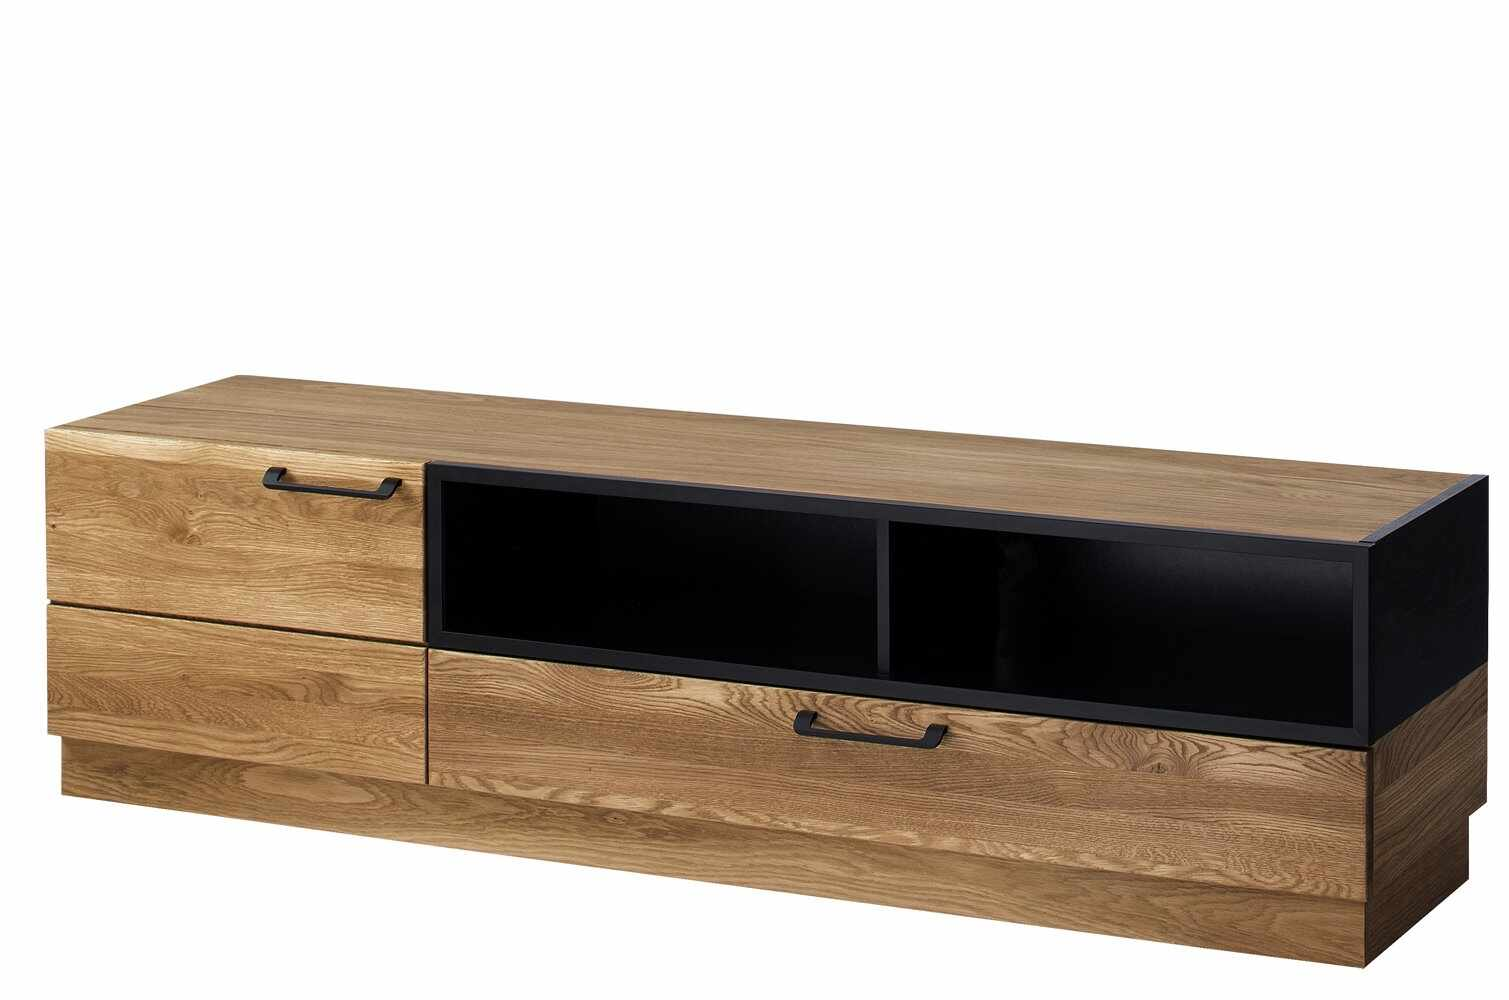 Comoda TV din lemn si furnir, cu 1 sertar si 1 usa Large Mosaic 25 Stejar / Negru, l170xA42xH46 cm la pret 2131 lei